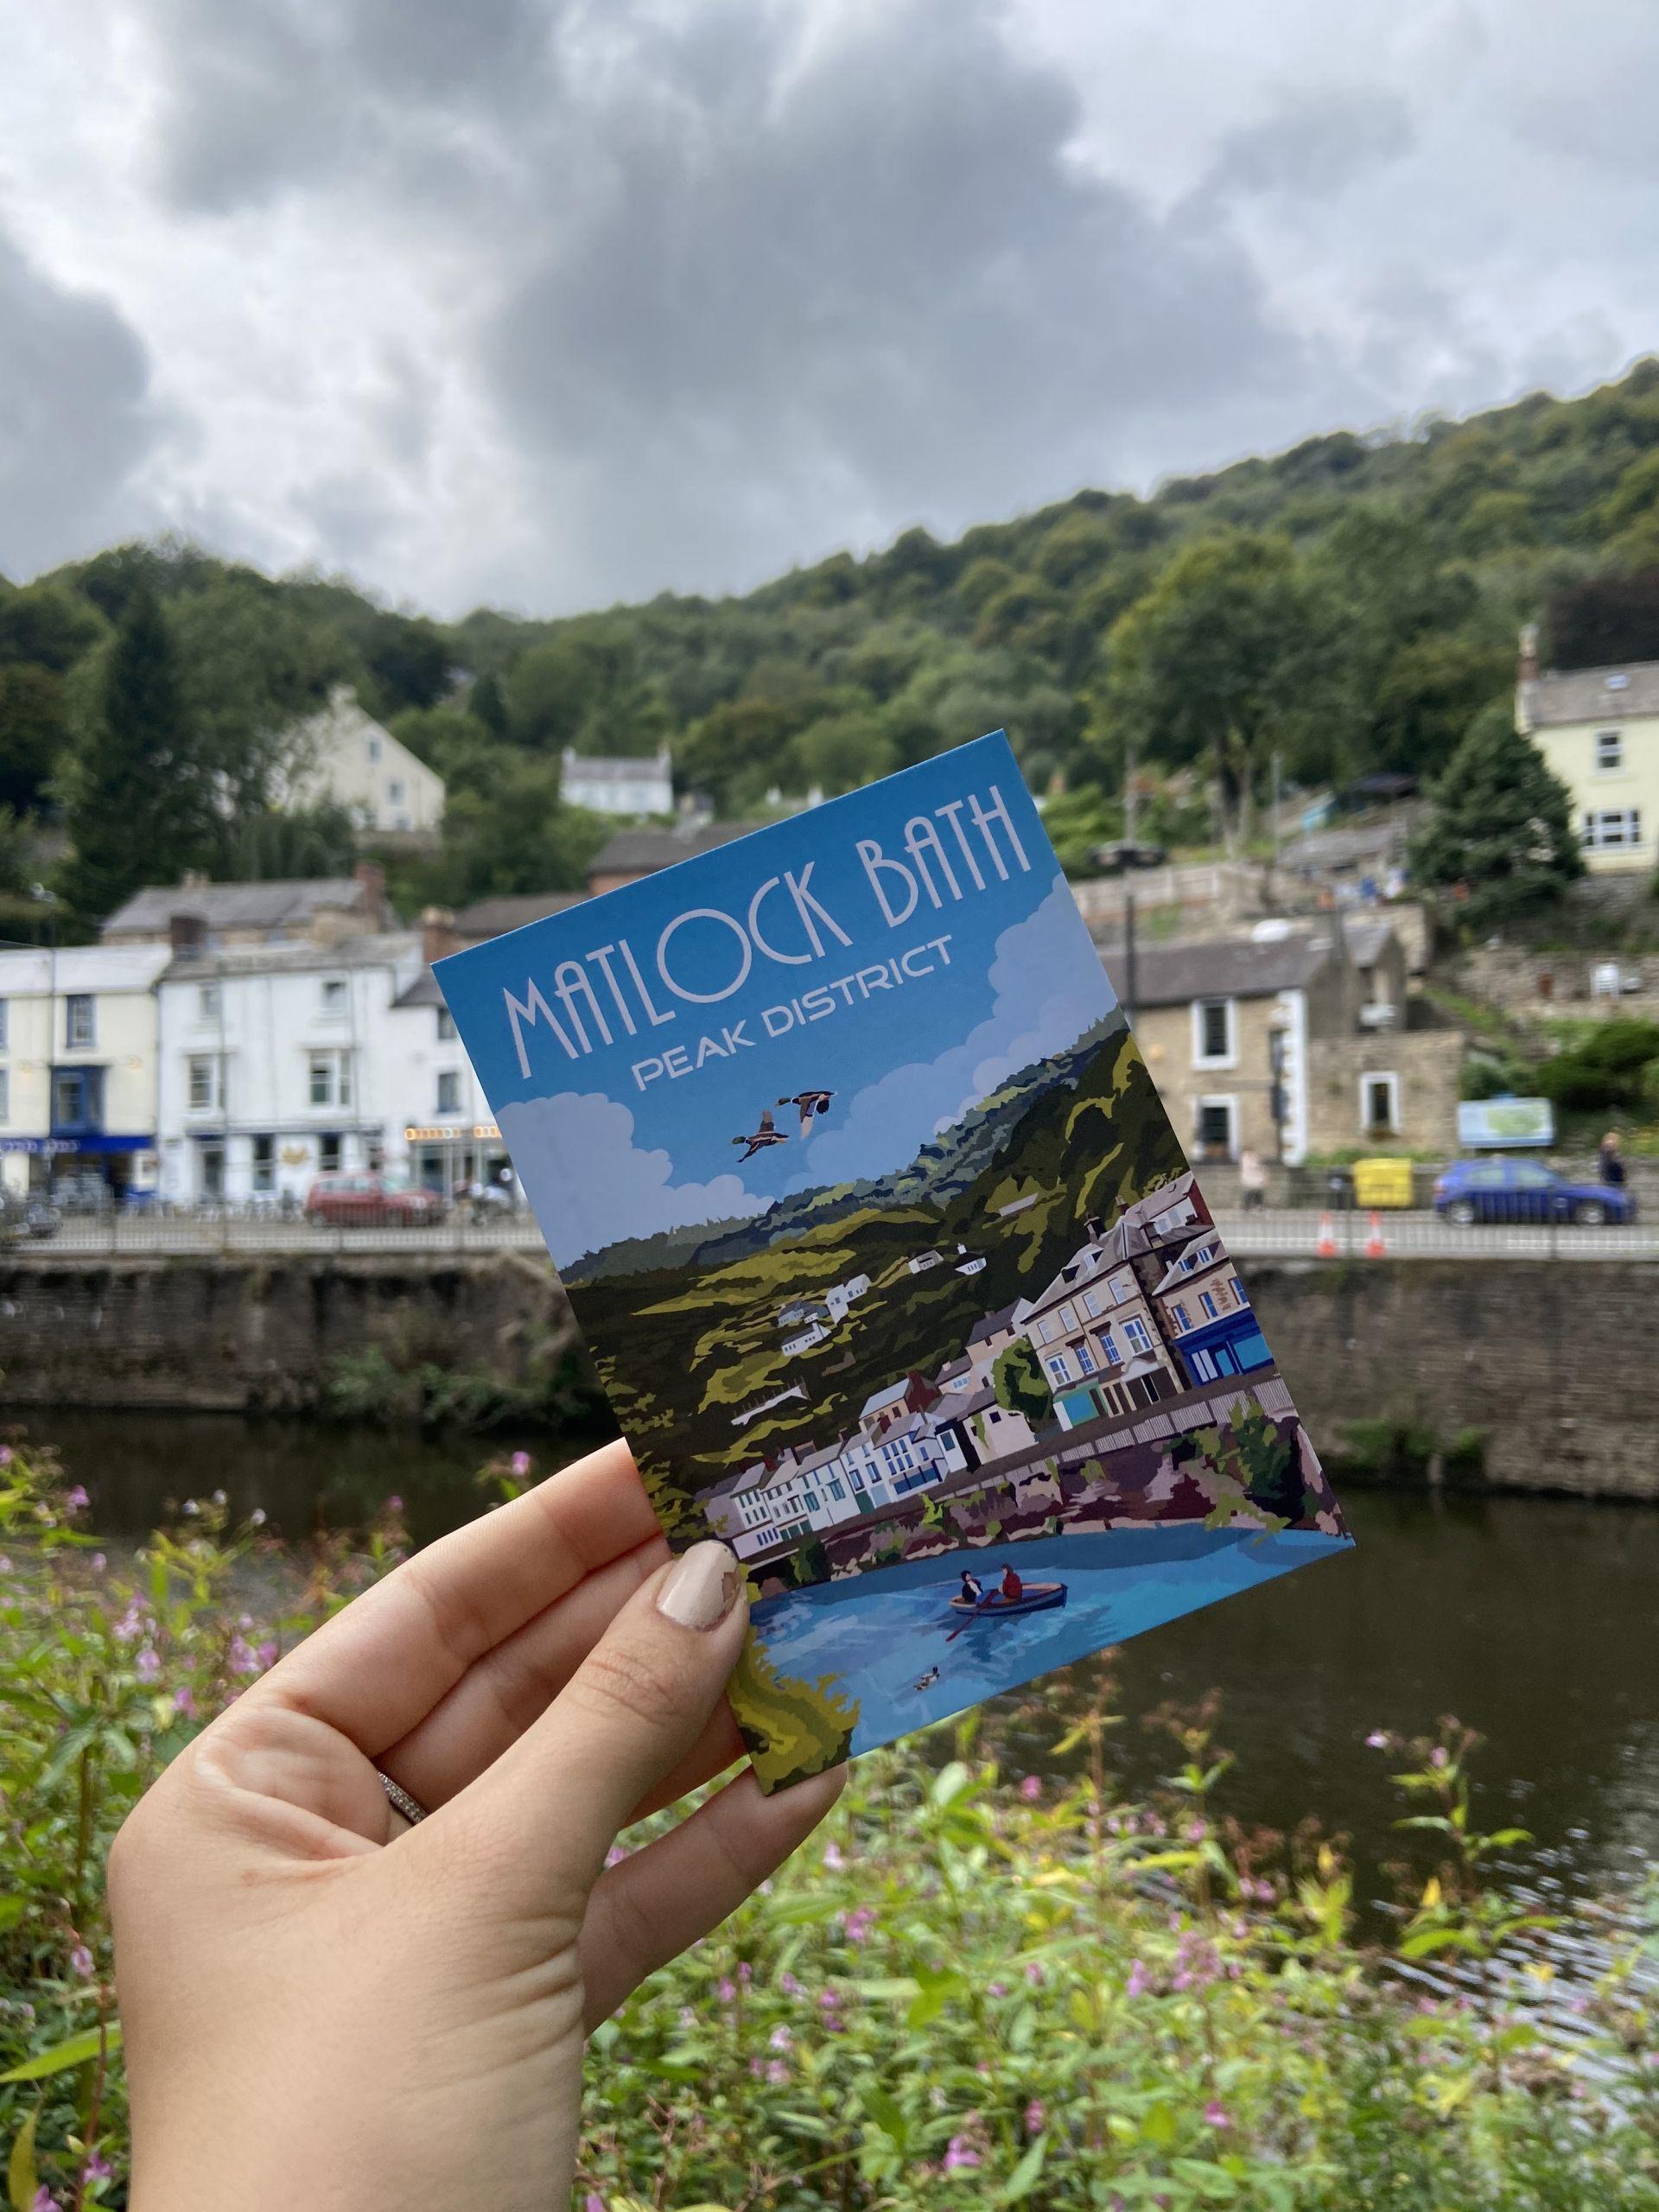 Matlock Bath (Peak District) postcard with the same view behind